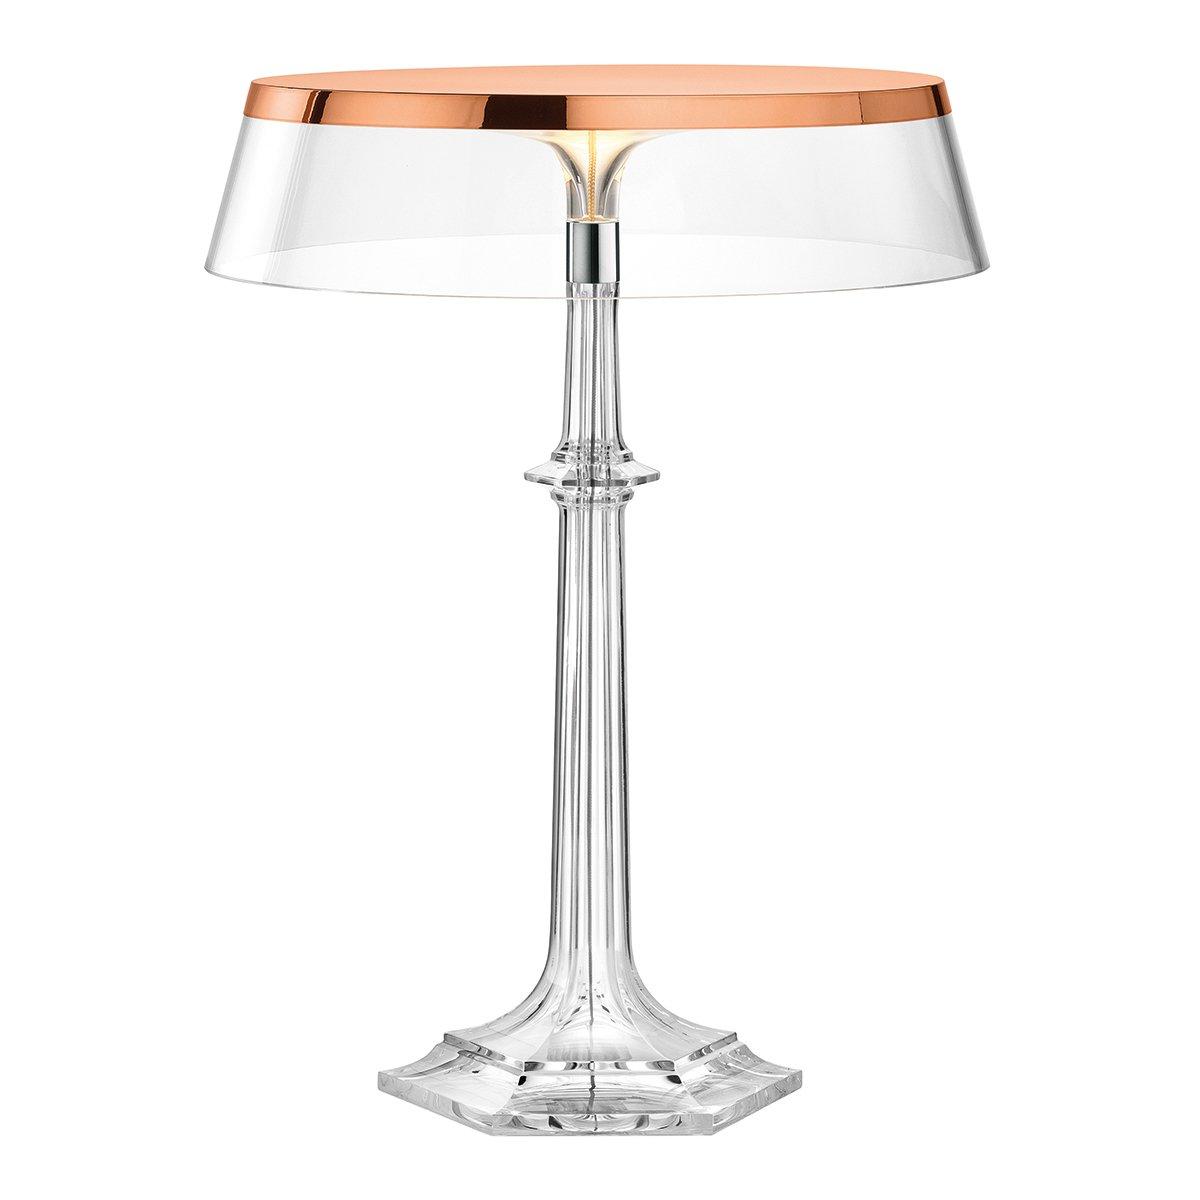 FLOS Bon Jour Versailles Tafellamp - Philippe Starck